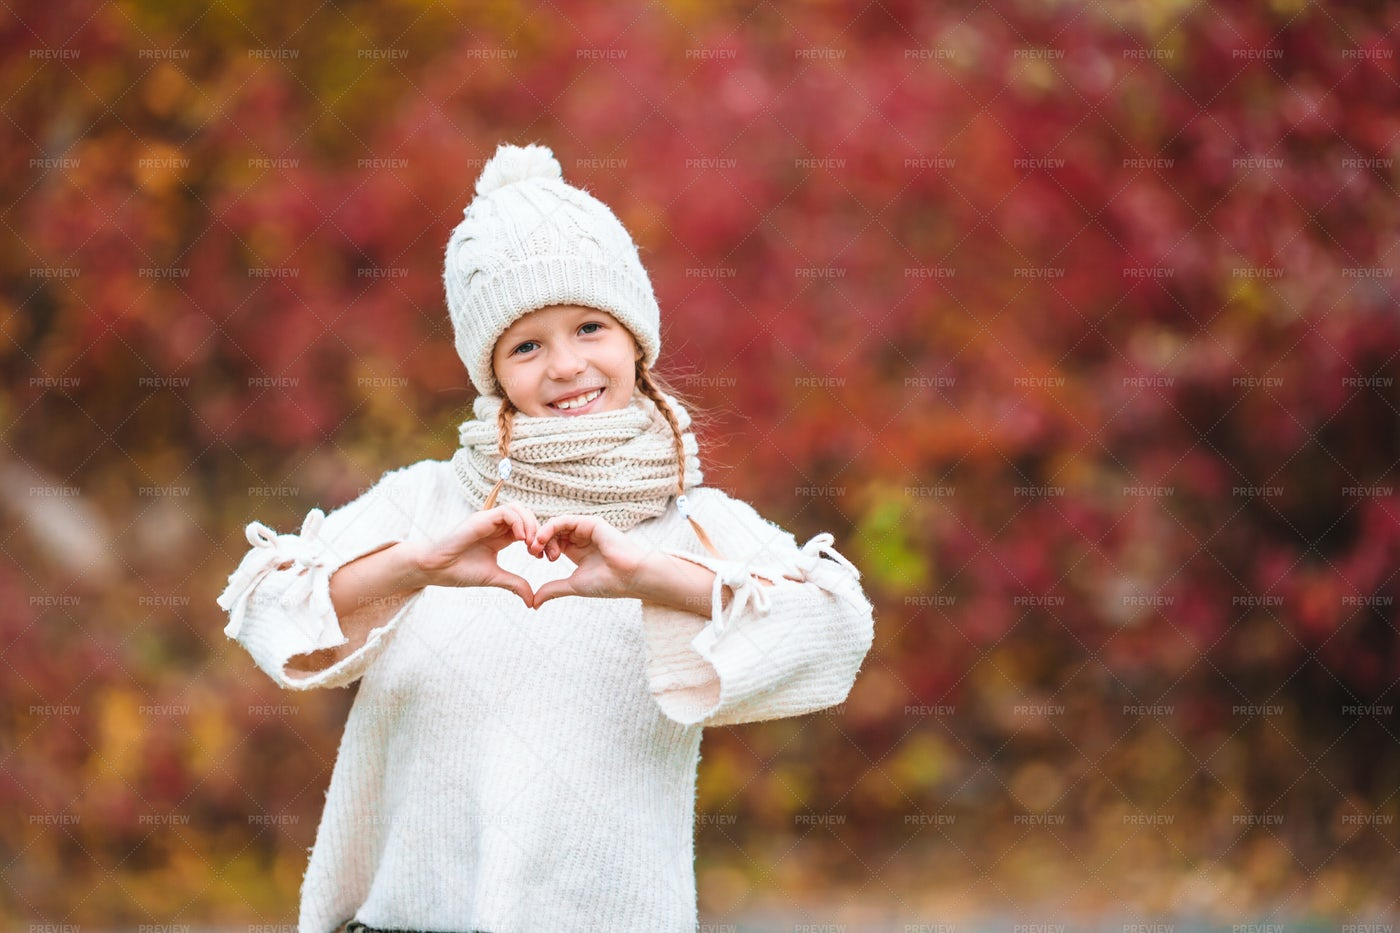 Girl Making Heart Symbol: Stock Photos